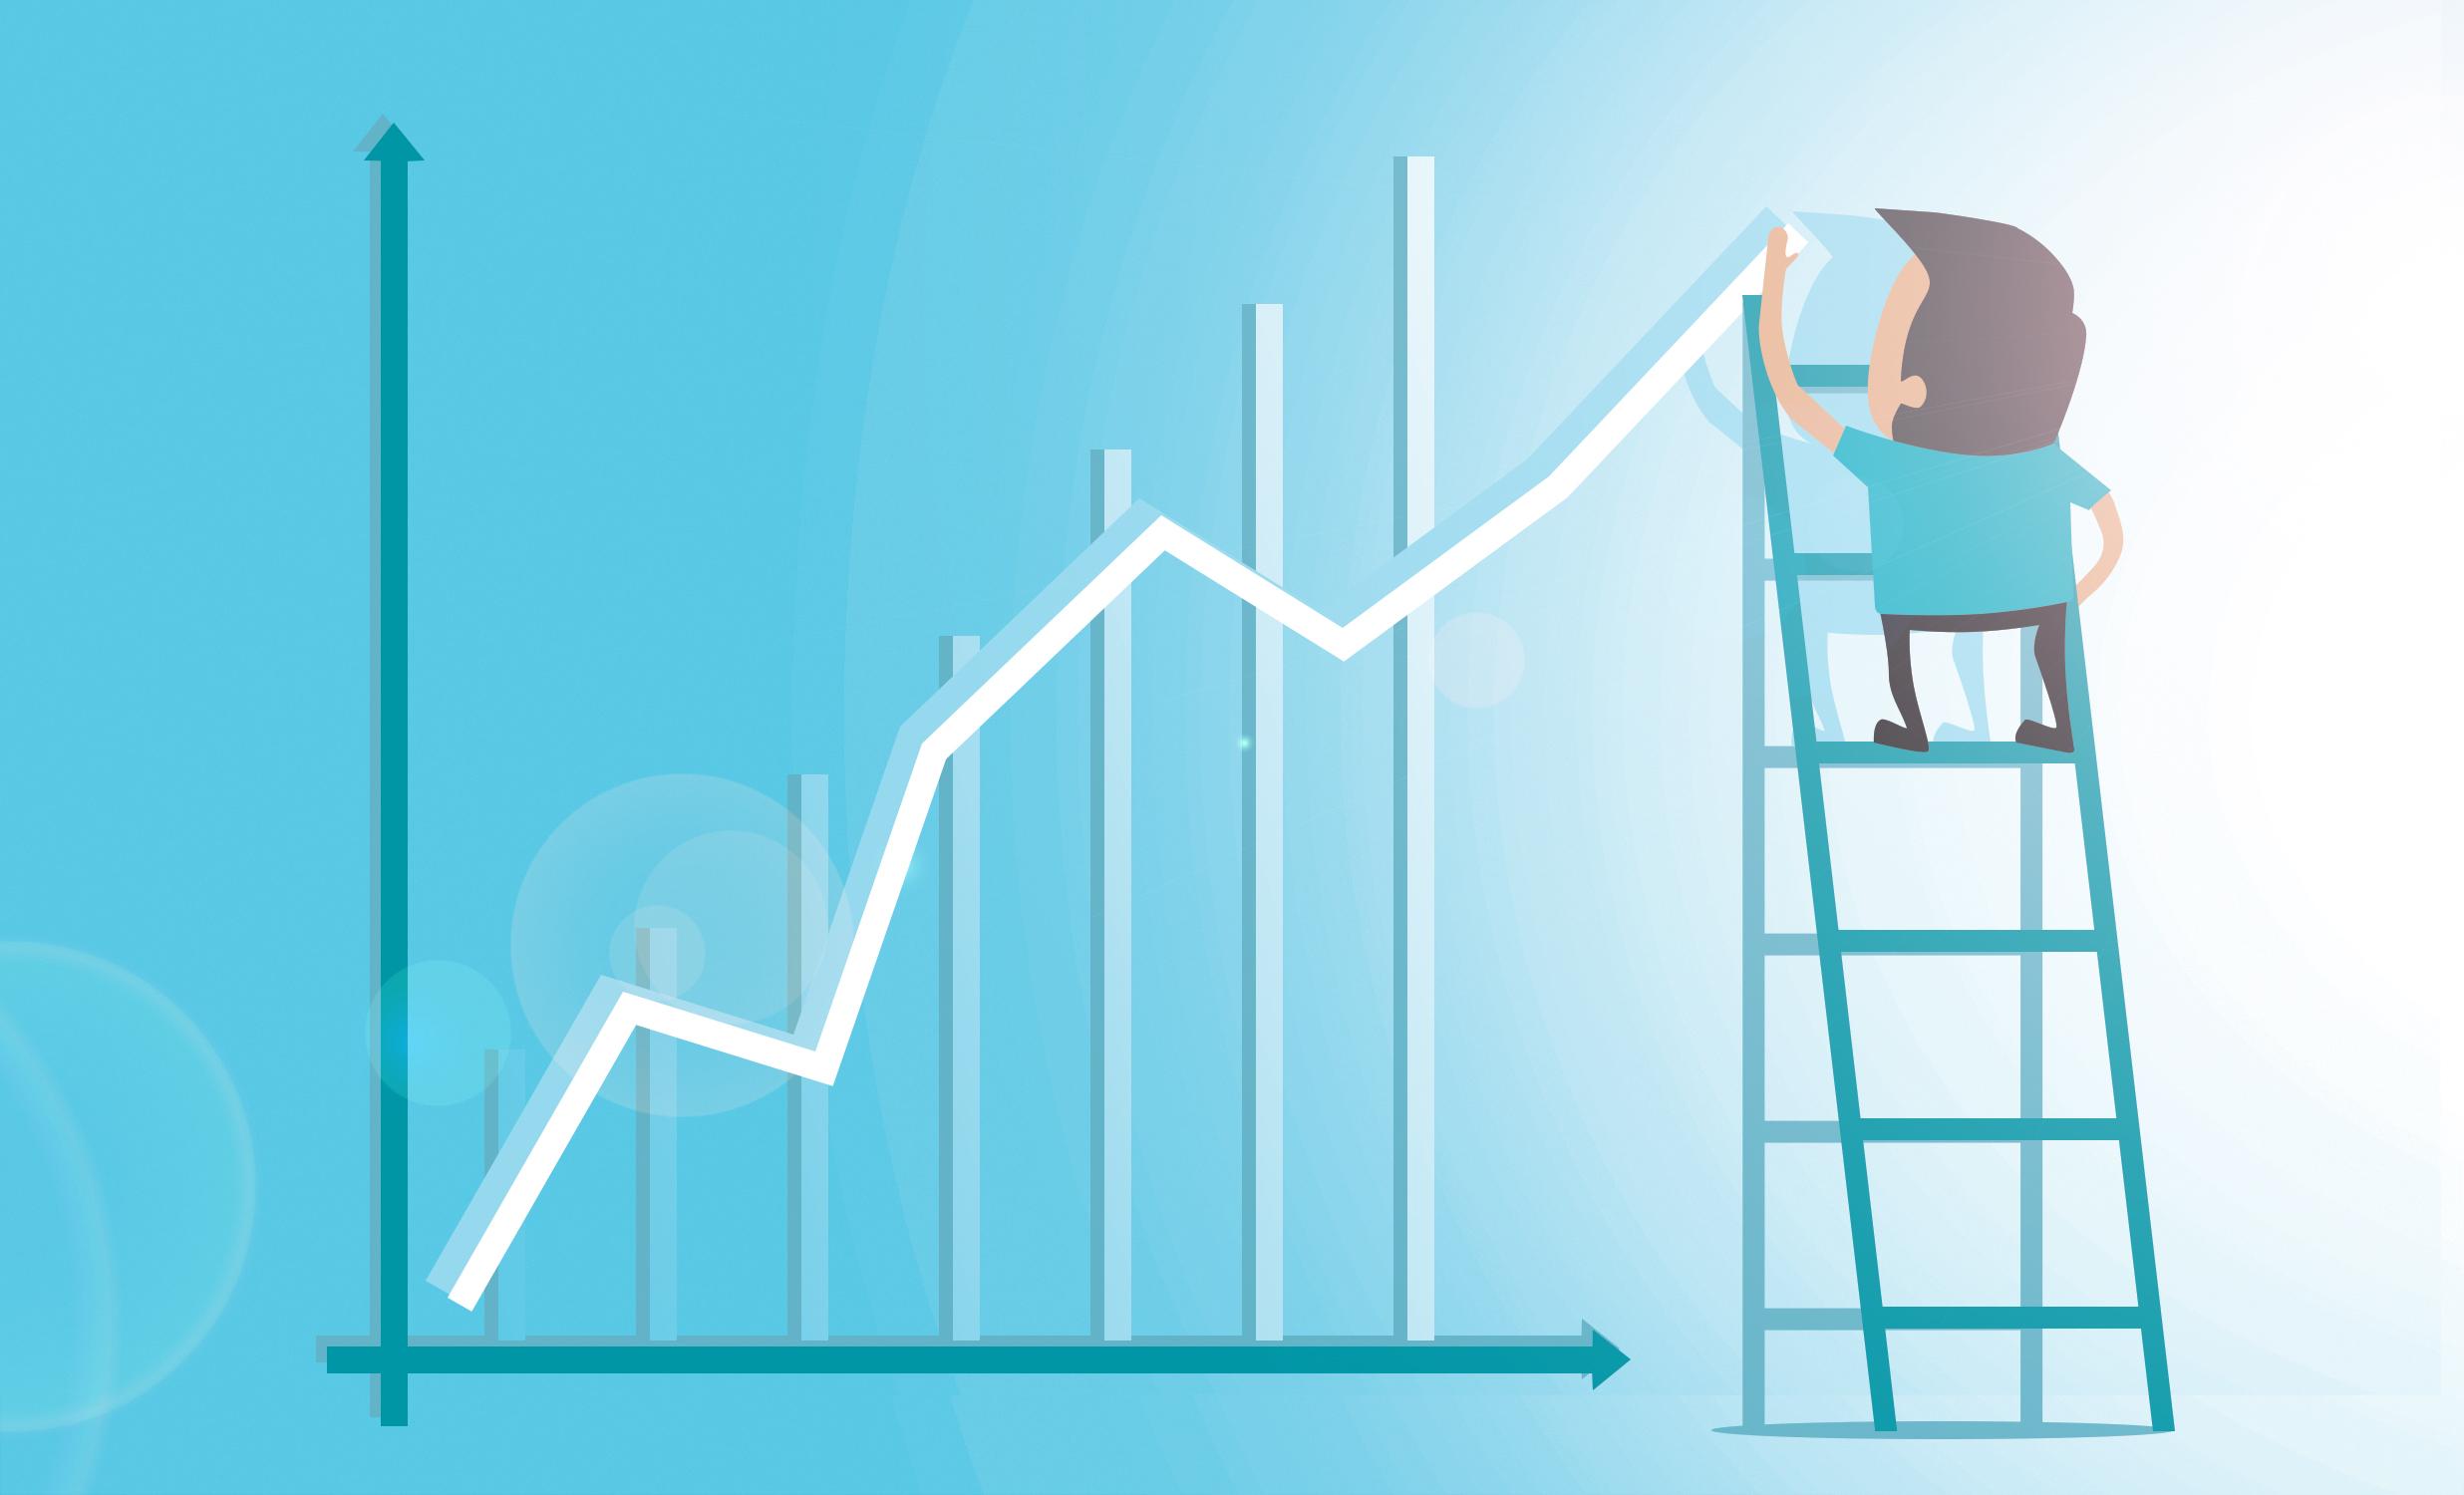 Possibilities of Web analytics and BI